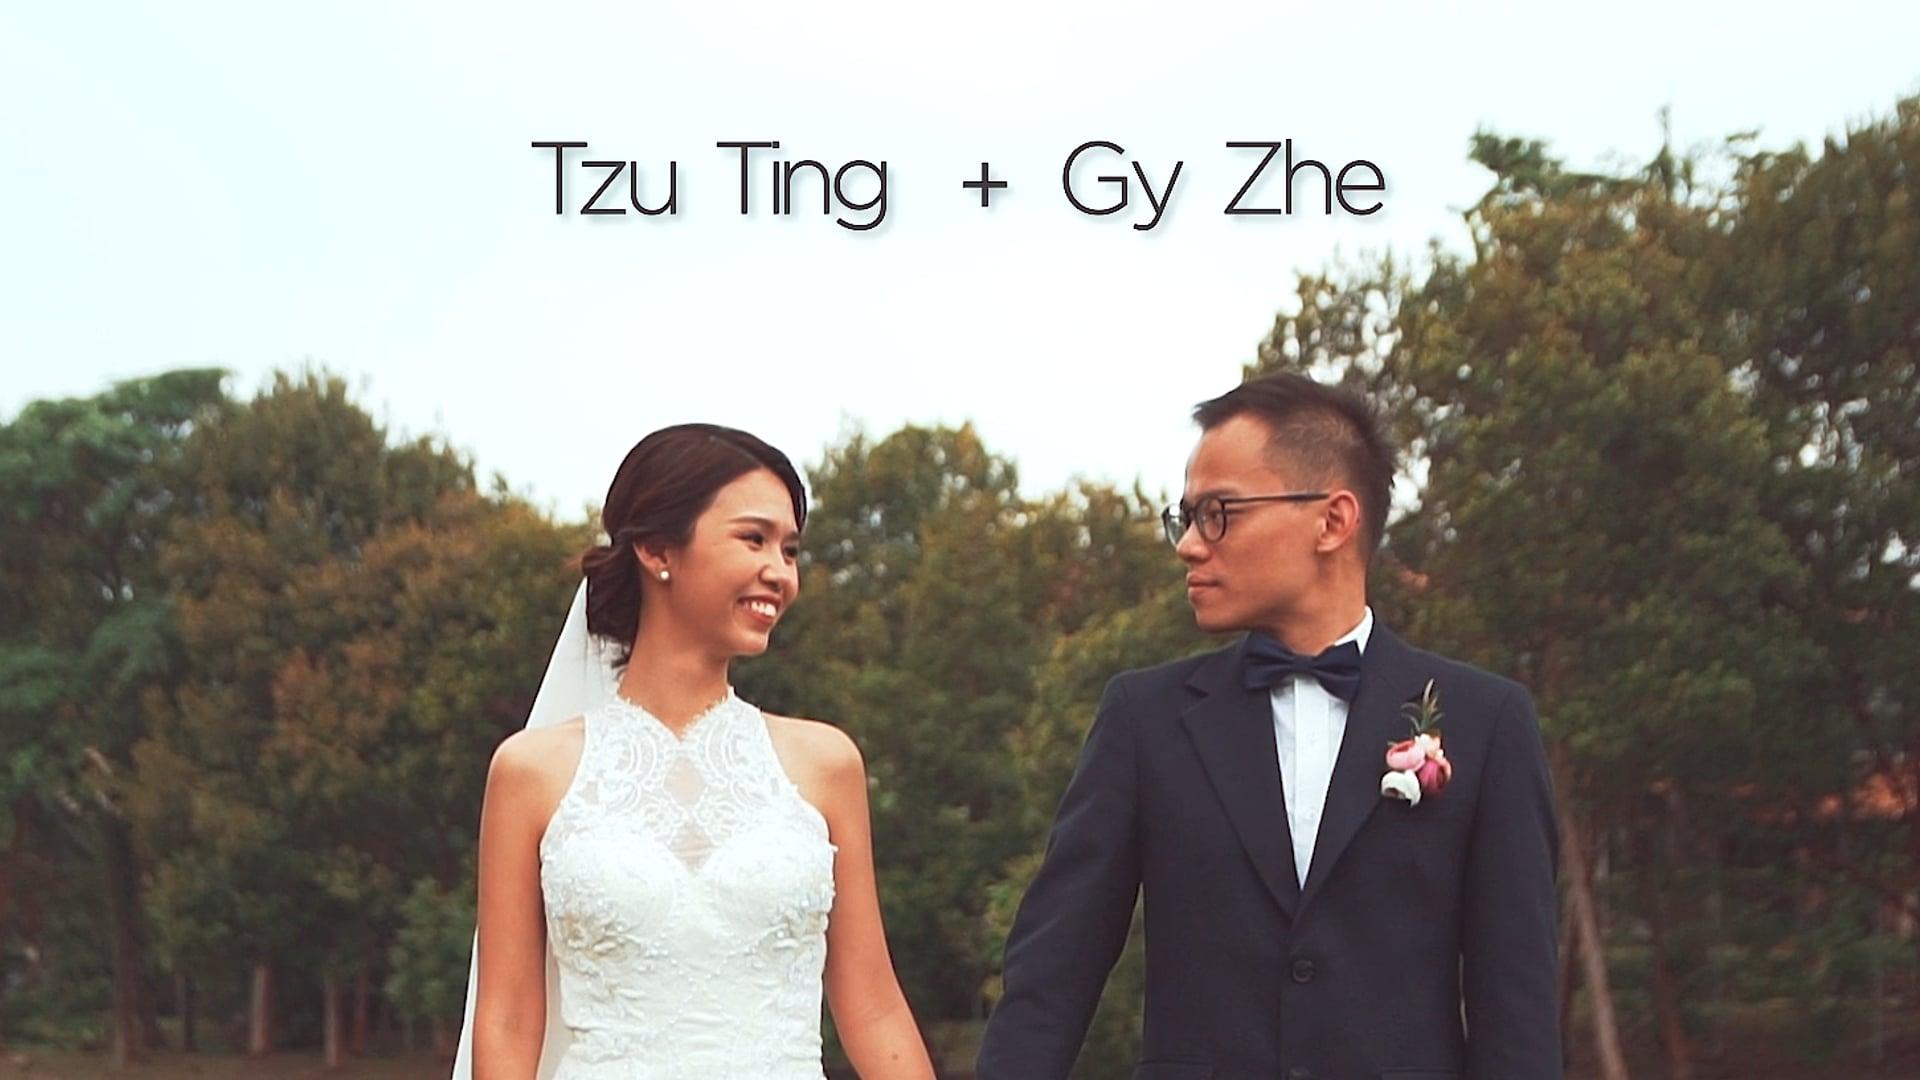 GyZhe & TzuTing